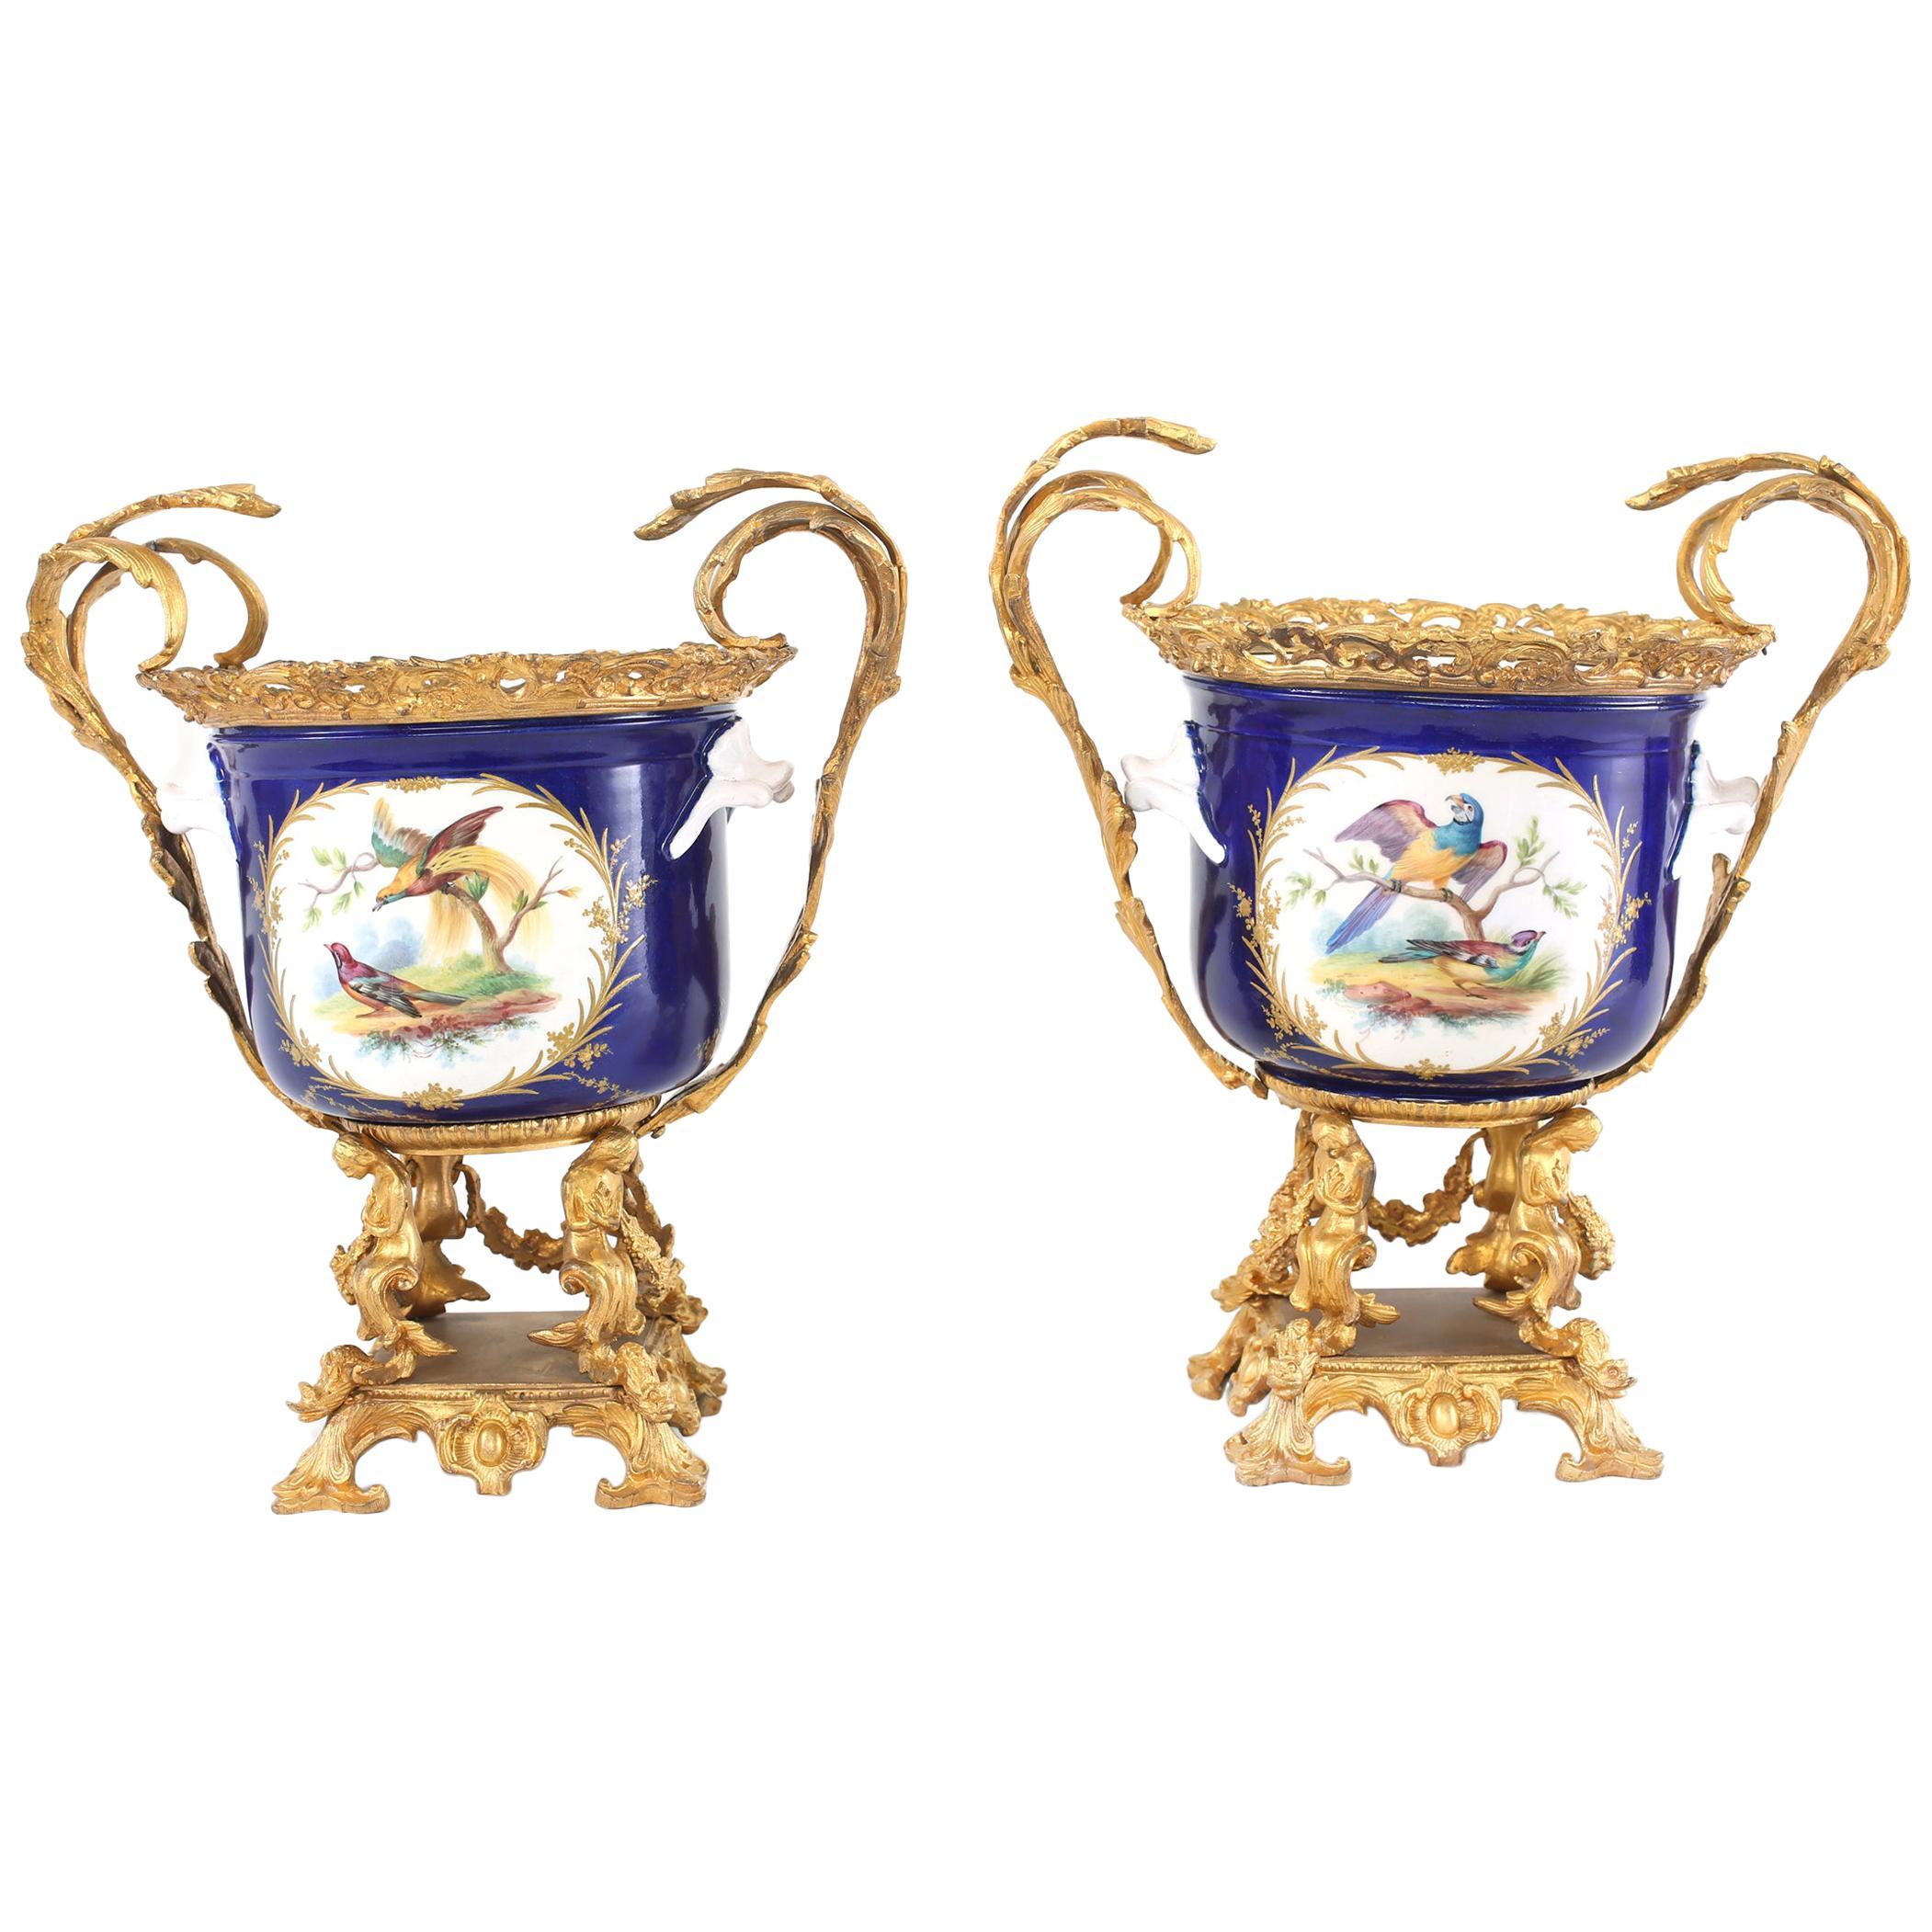 French Pair Gilt Bronze Mounted / Porcelain Pair Urns / Vases